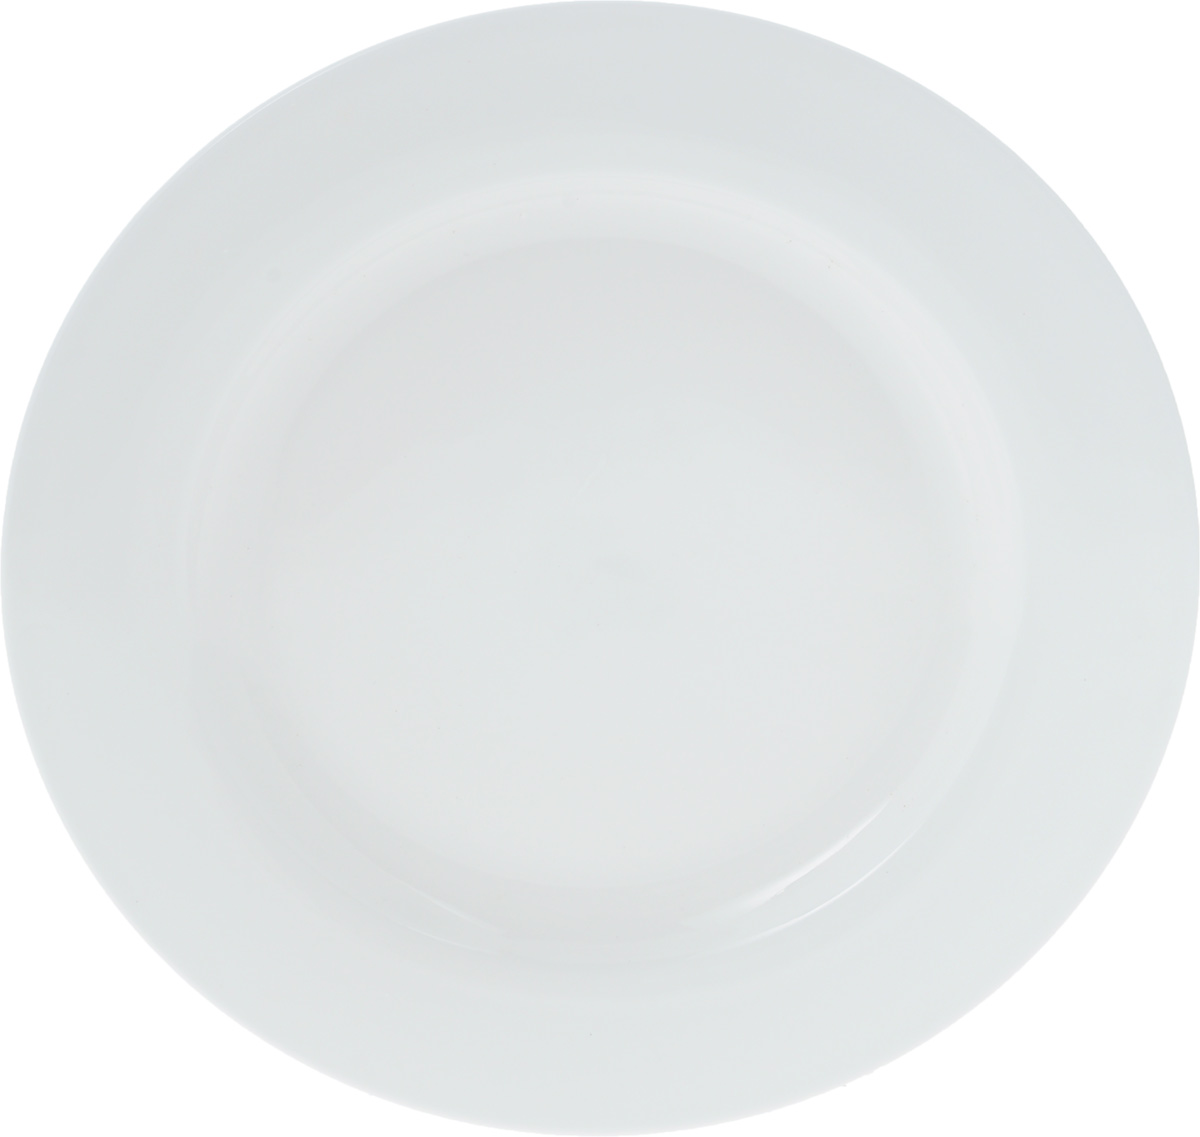 Тарелка Wilmax, диаметр 25,5 см. WL-991180 / A